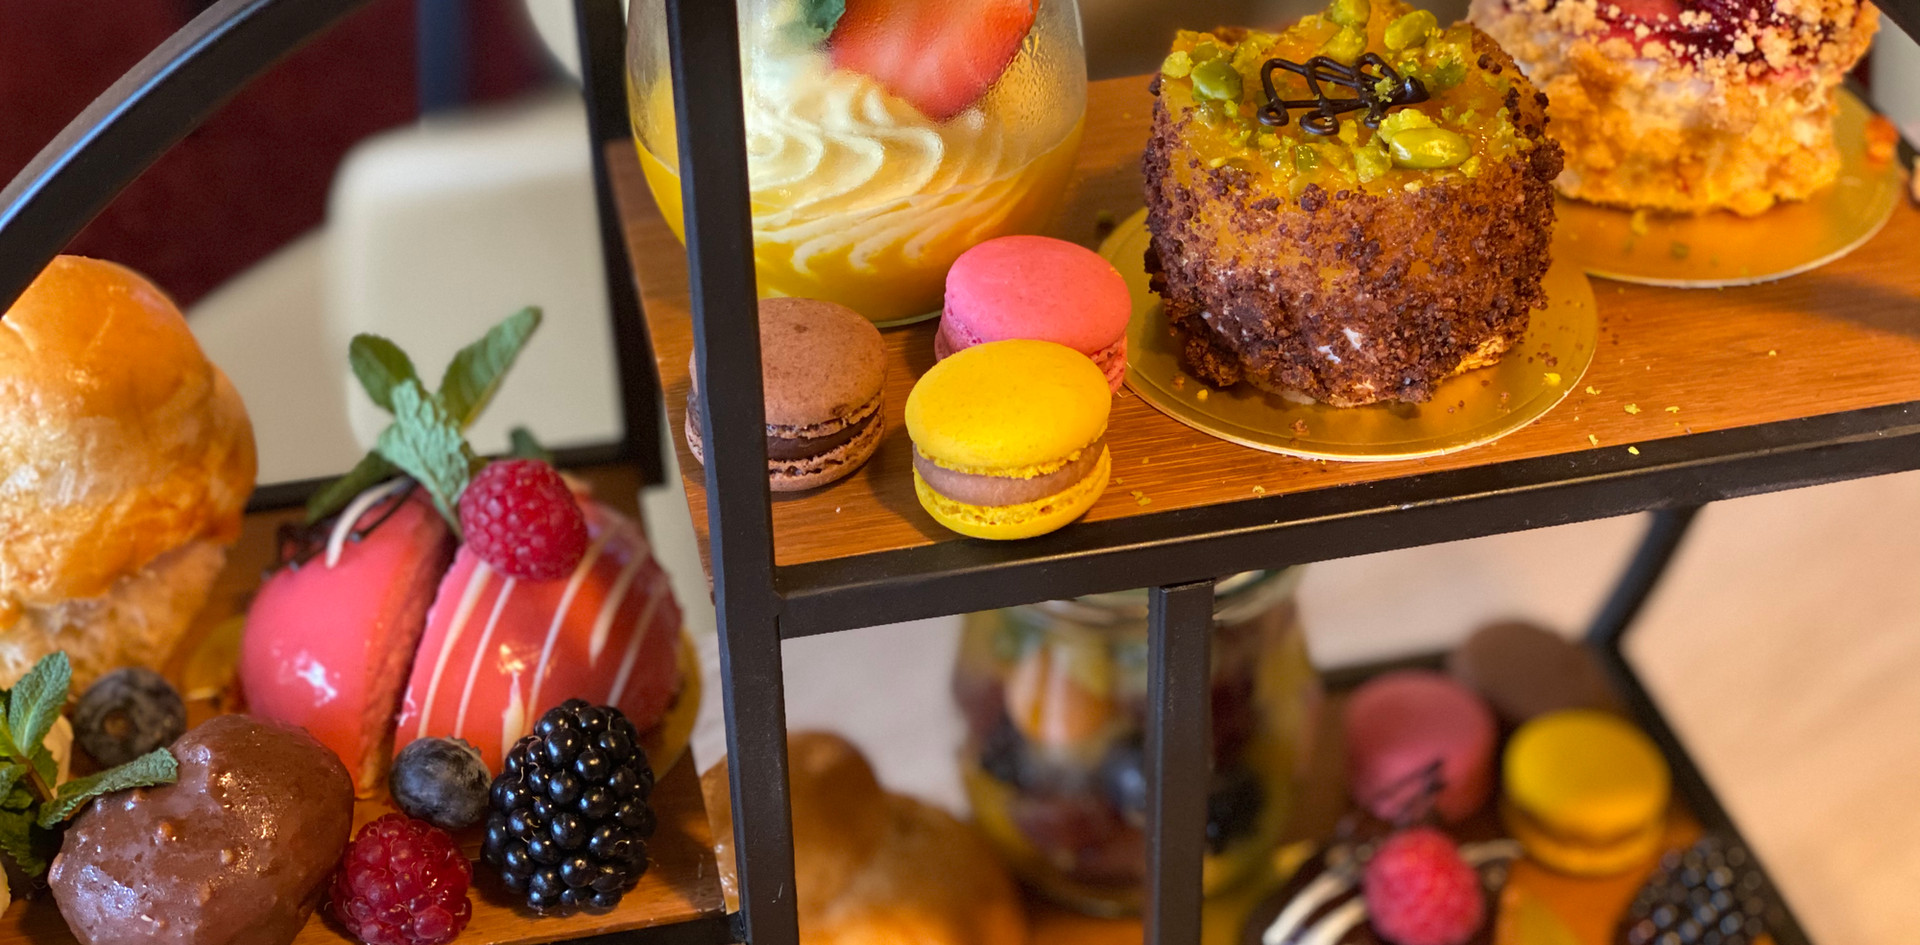 Etagere Afternoon Tea - Hotel Wegner - The culinary Art Hotel